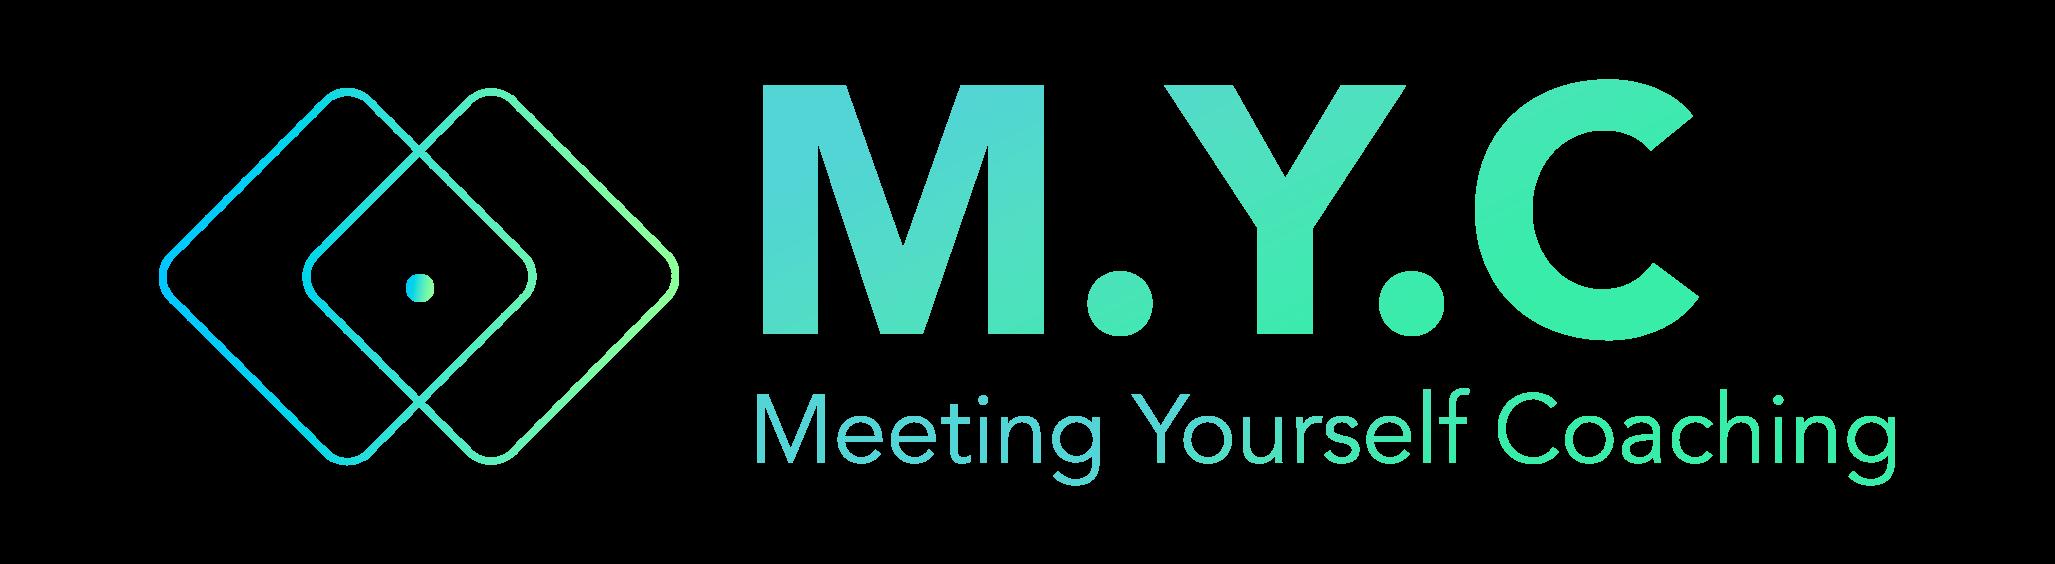 M.Y.C : Meeting Yourself Coaching